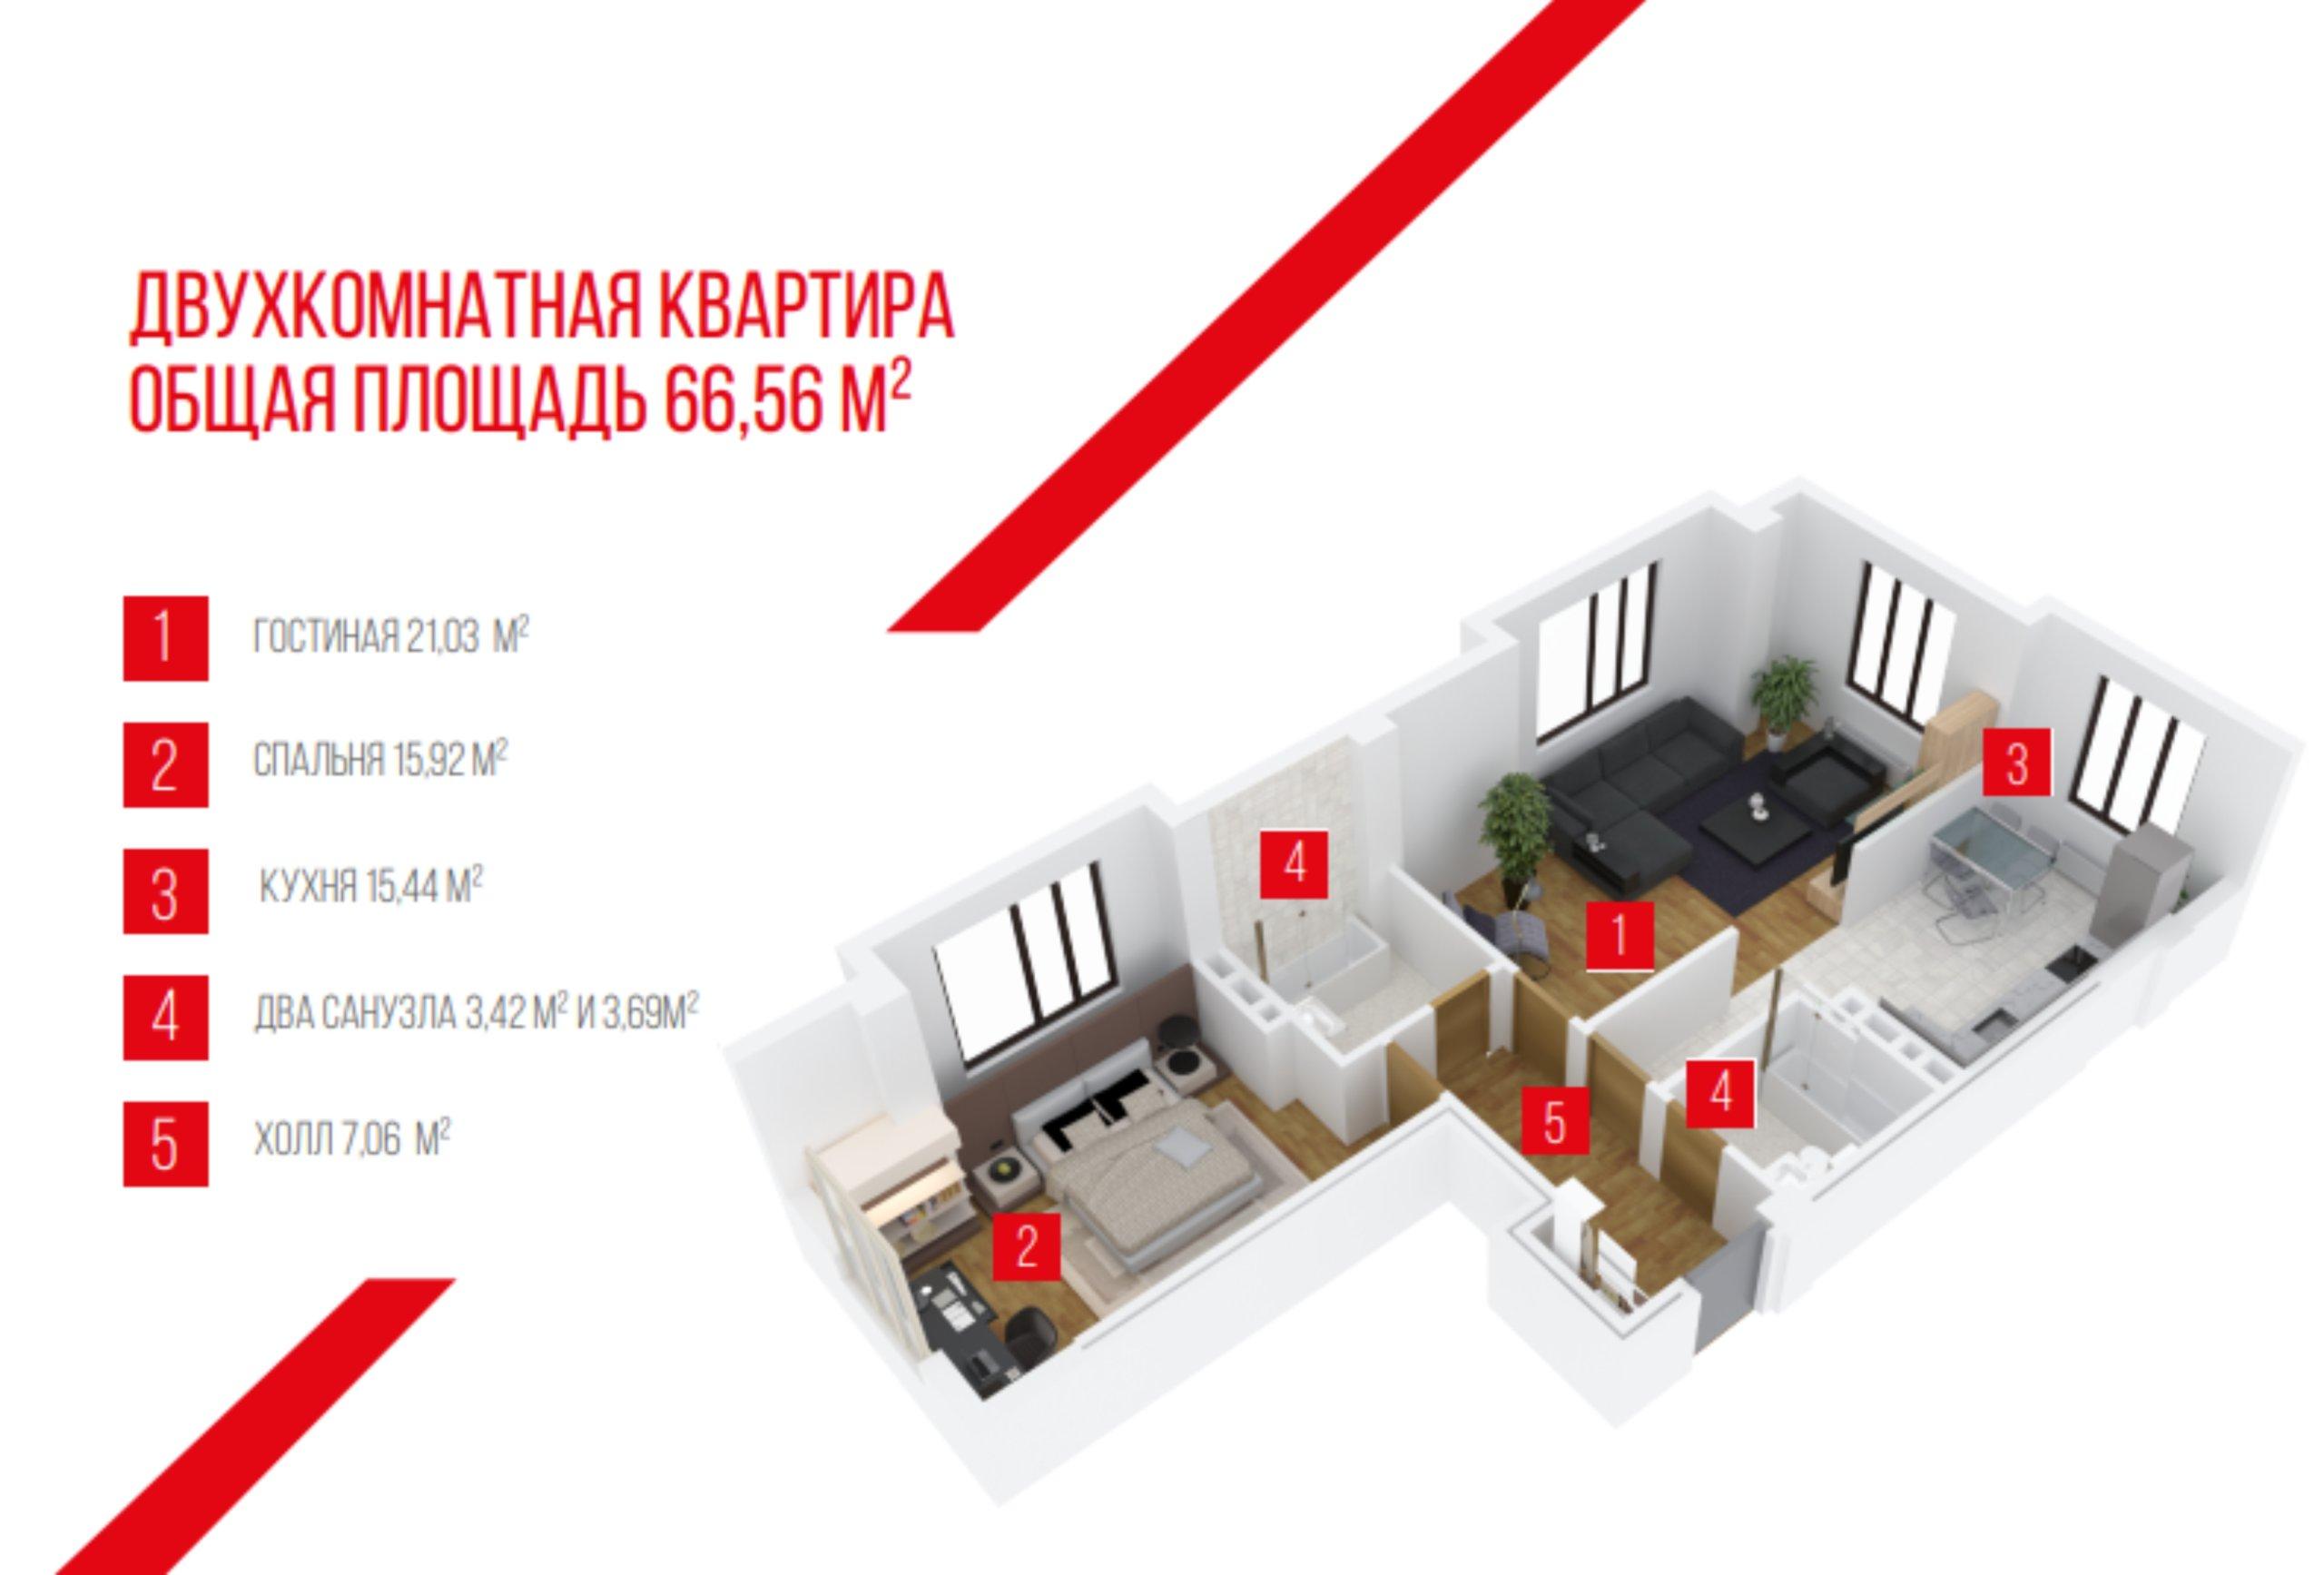 2-х комнатная квартира 66,56 кв.м.